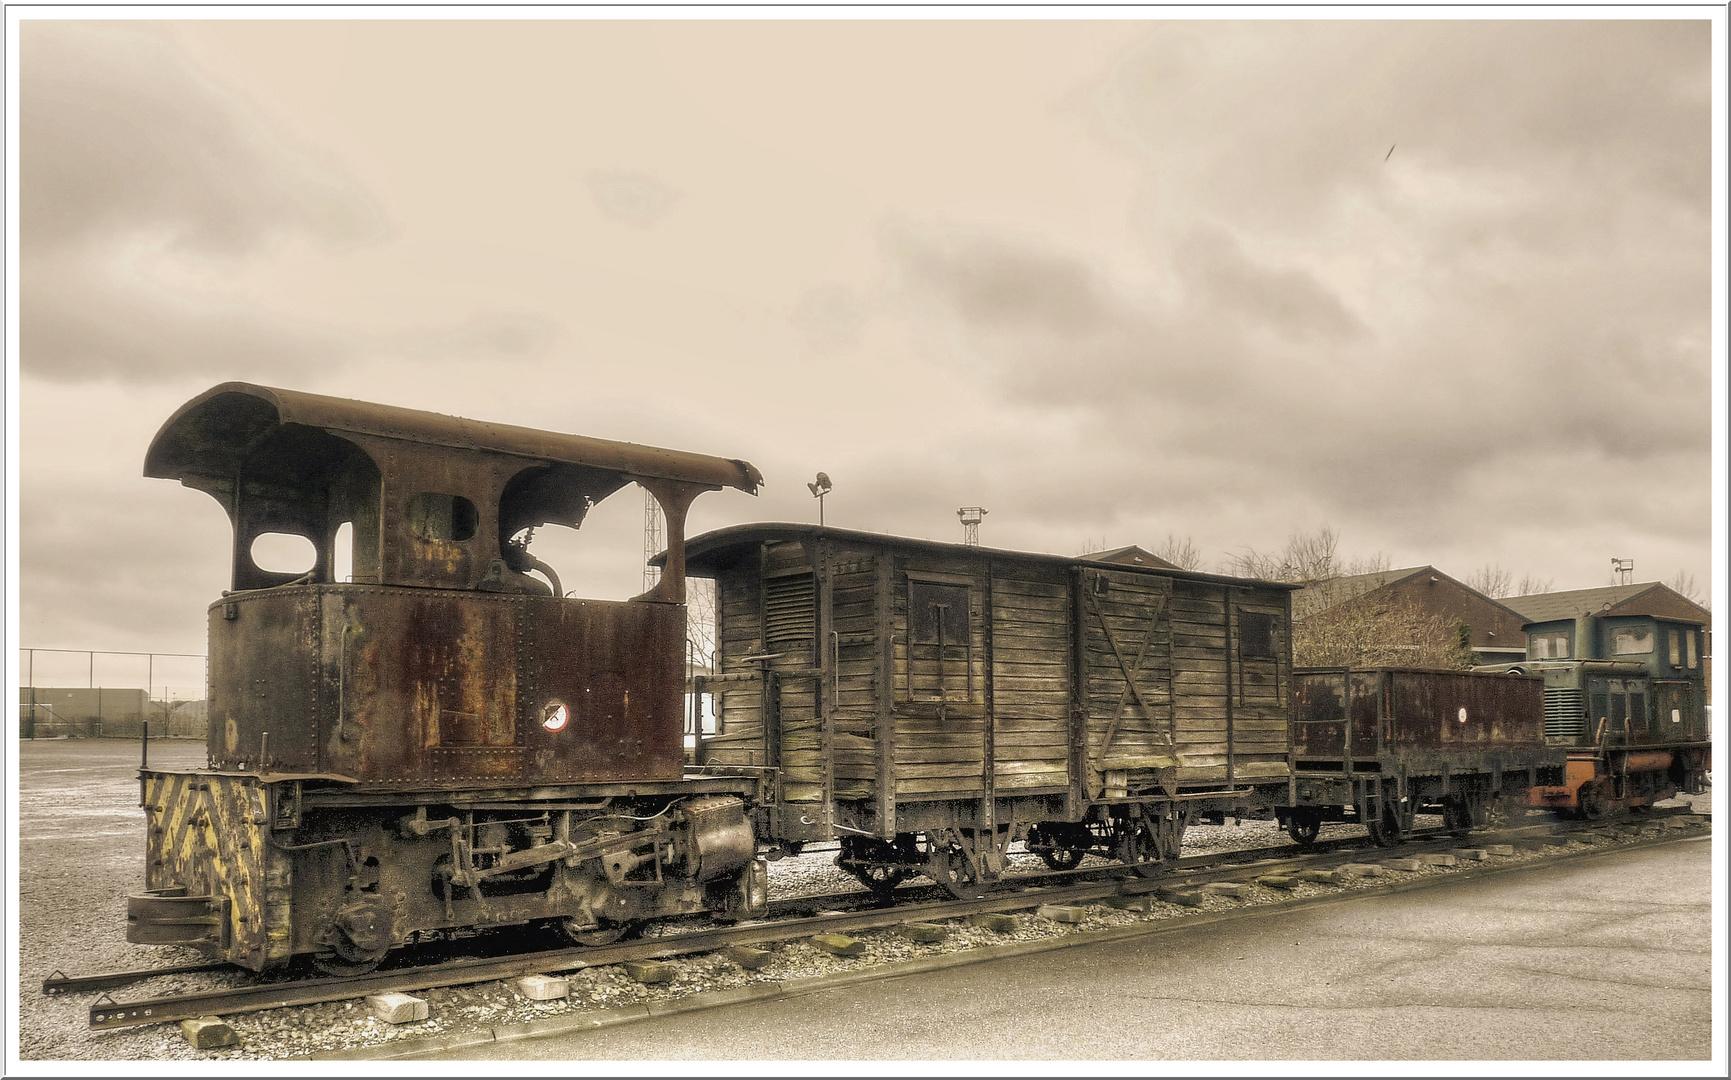 BLEGNY MINE - le vieux train